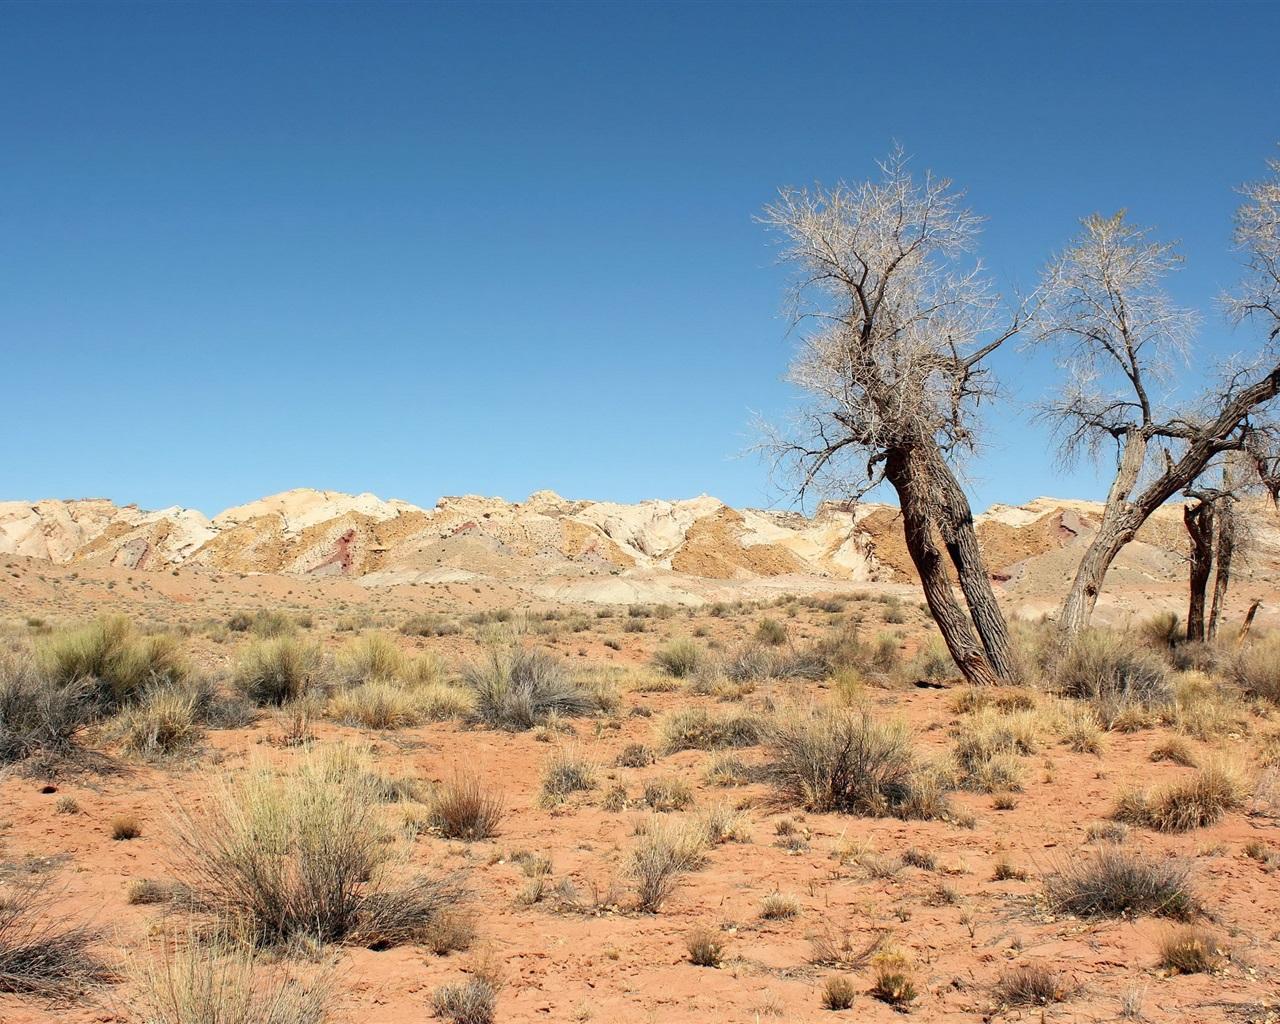 download wallpaper 1280x1024 desert trees grass sky hd. Black Bedroom Furniture Sets. Home Design Ideas